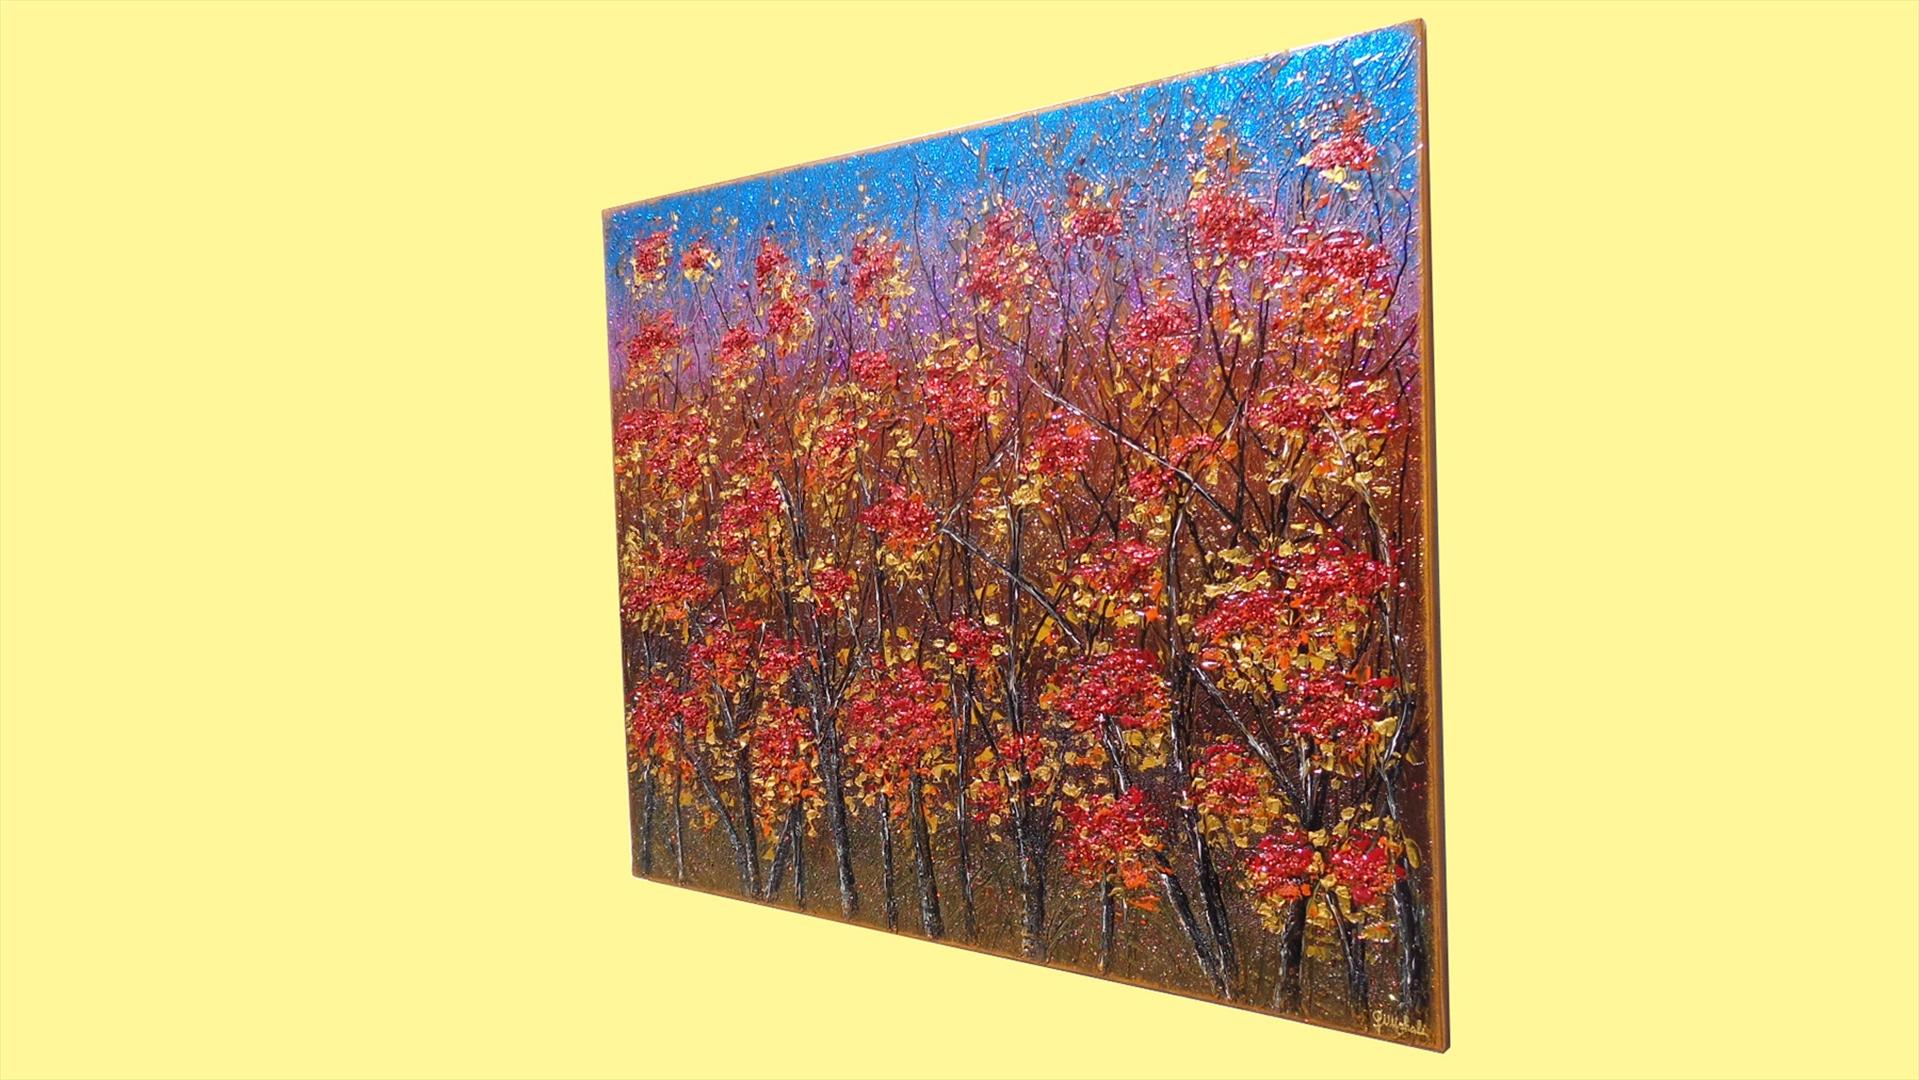 Autunno vendita quadri online quadri moderni quadri for Quadri moderni online